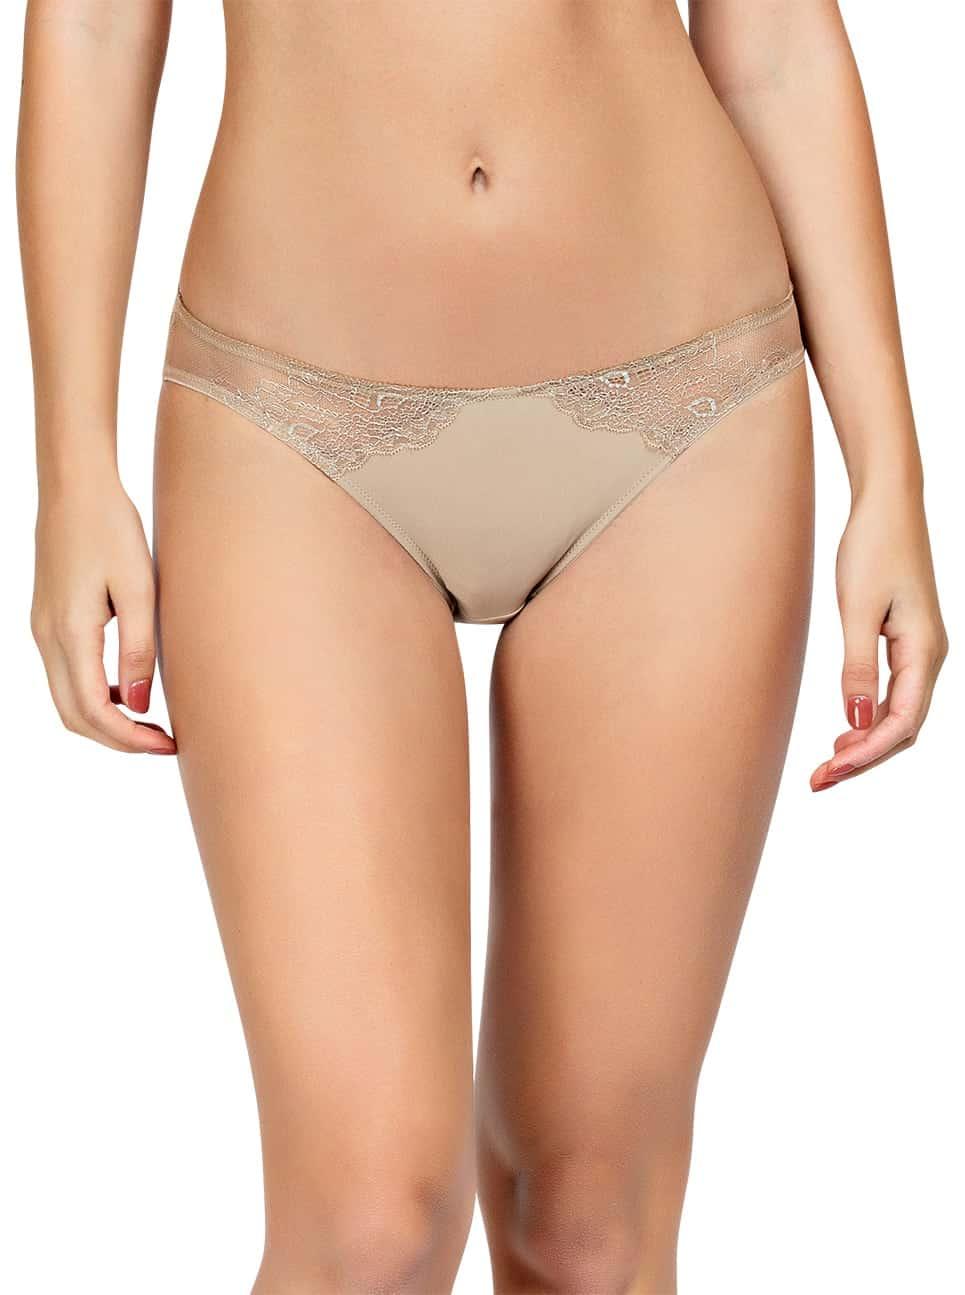 Allure Bikini – European Nude – A1493 1